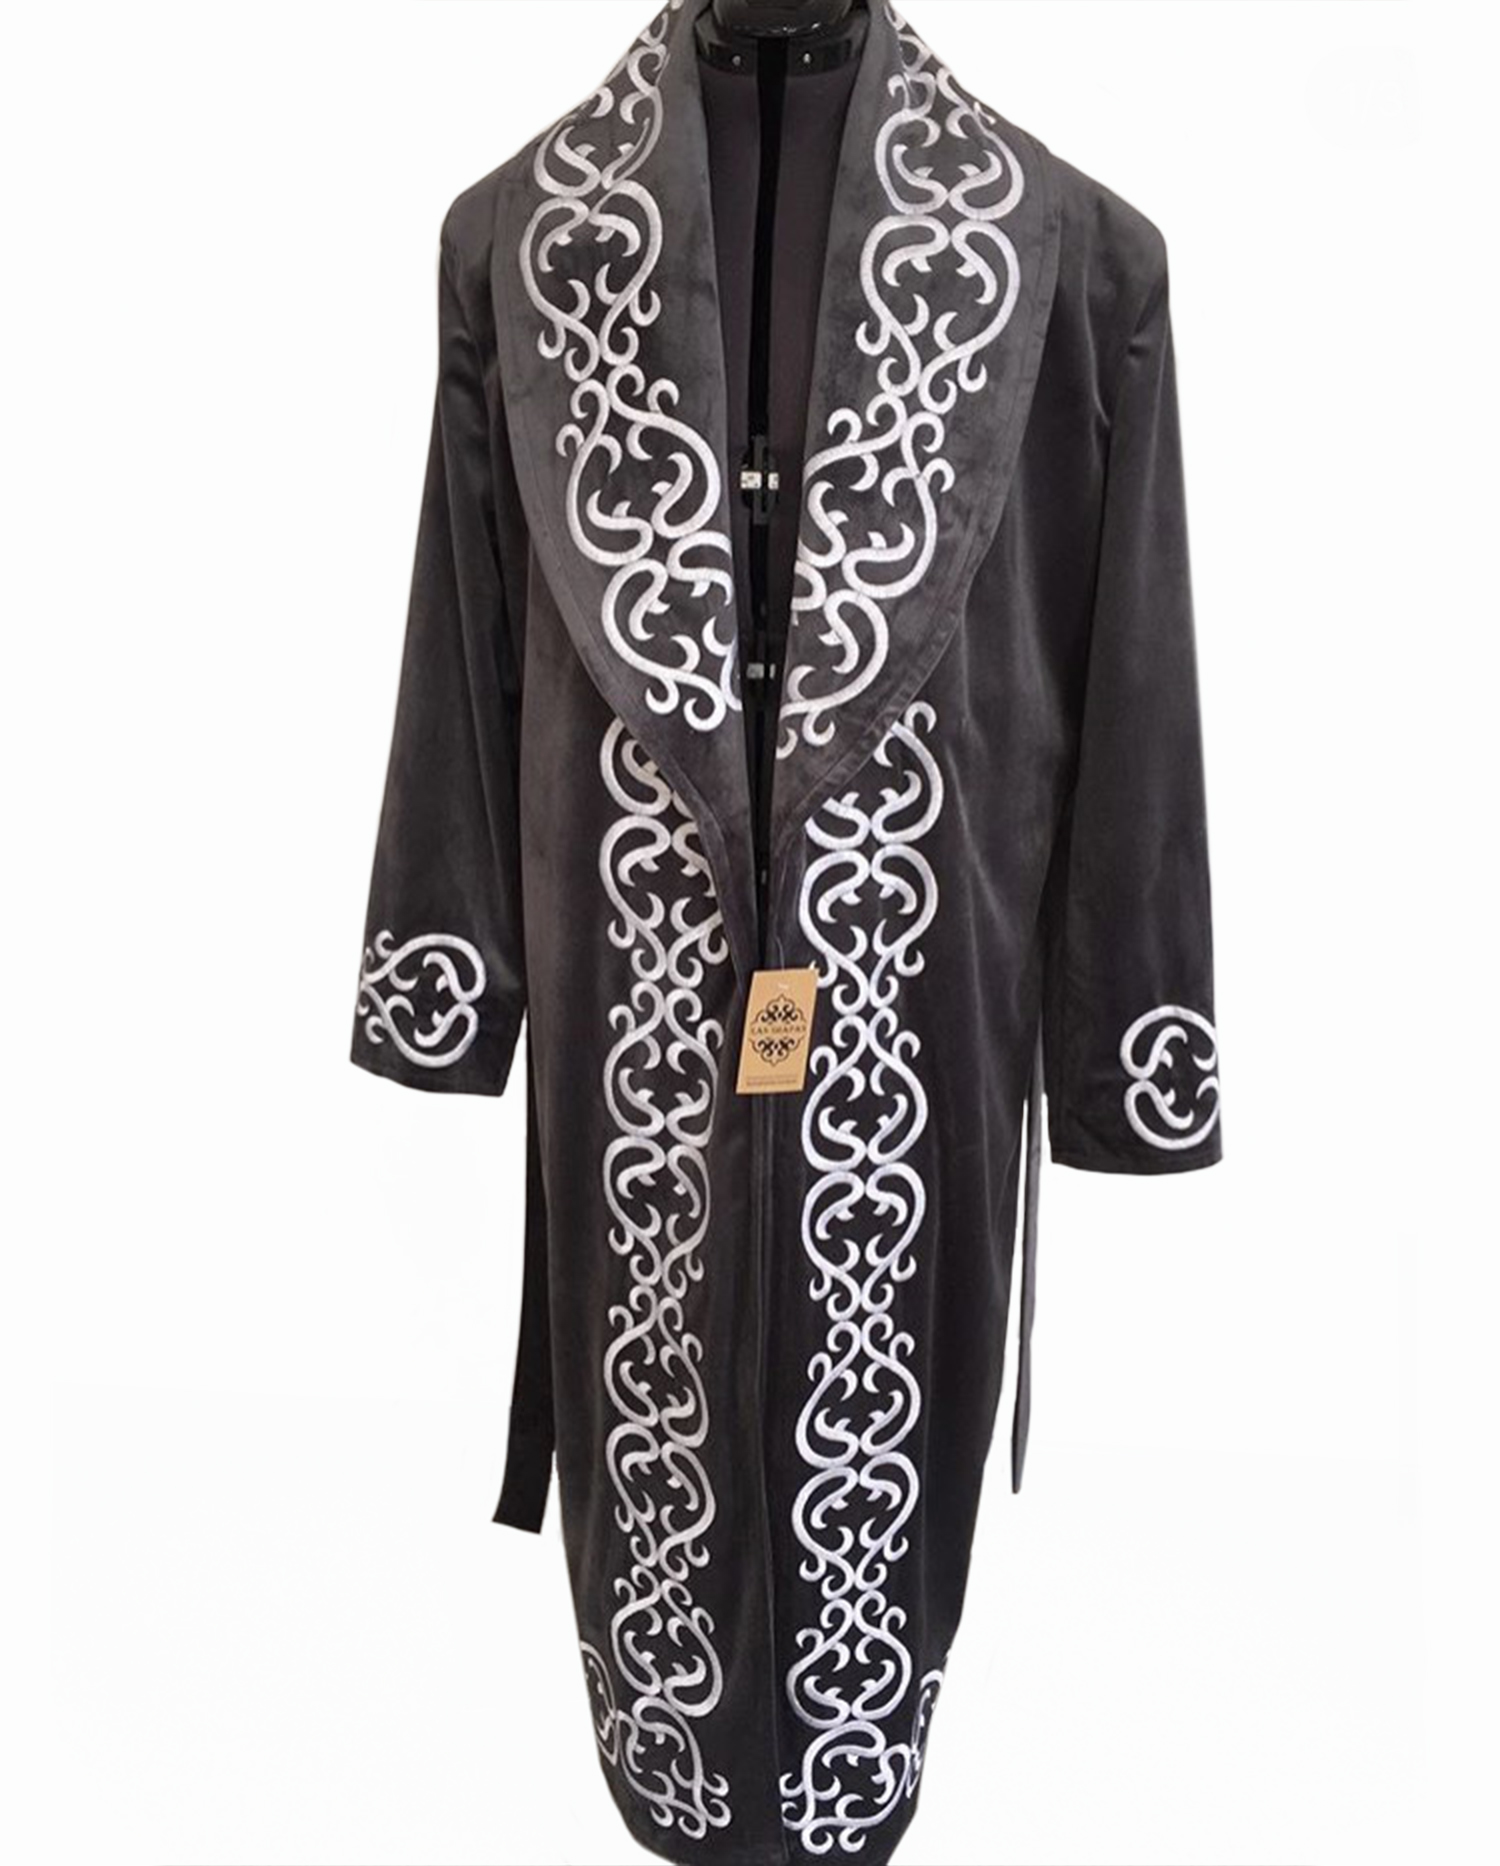 Kazakh National Chapan Men Clothing Long Sleeves